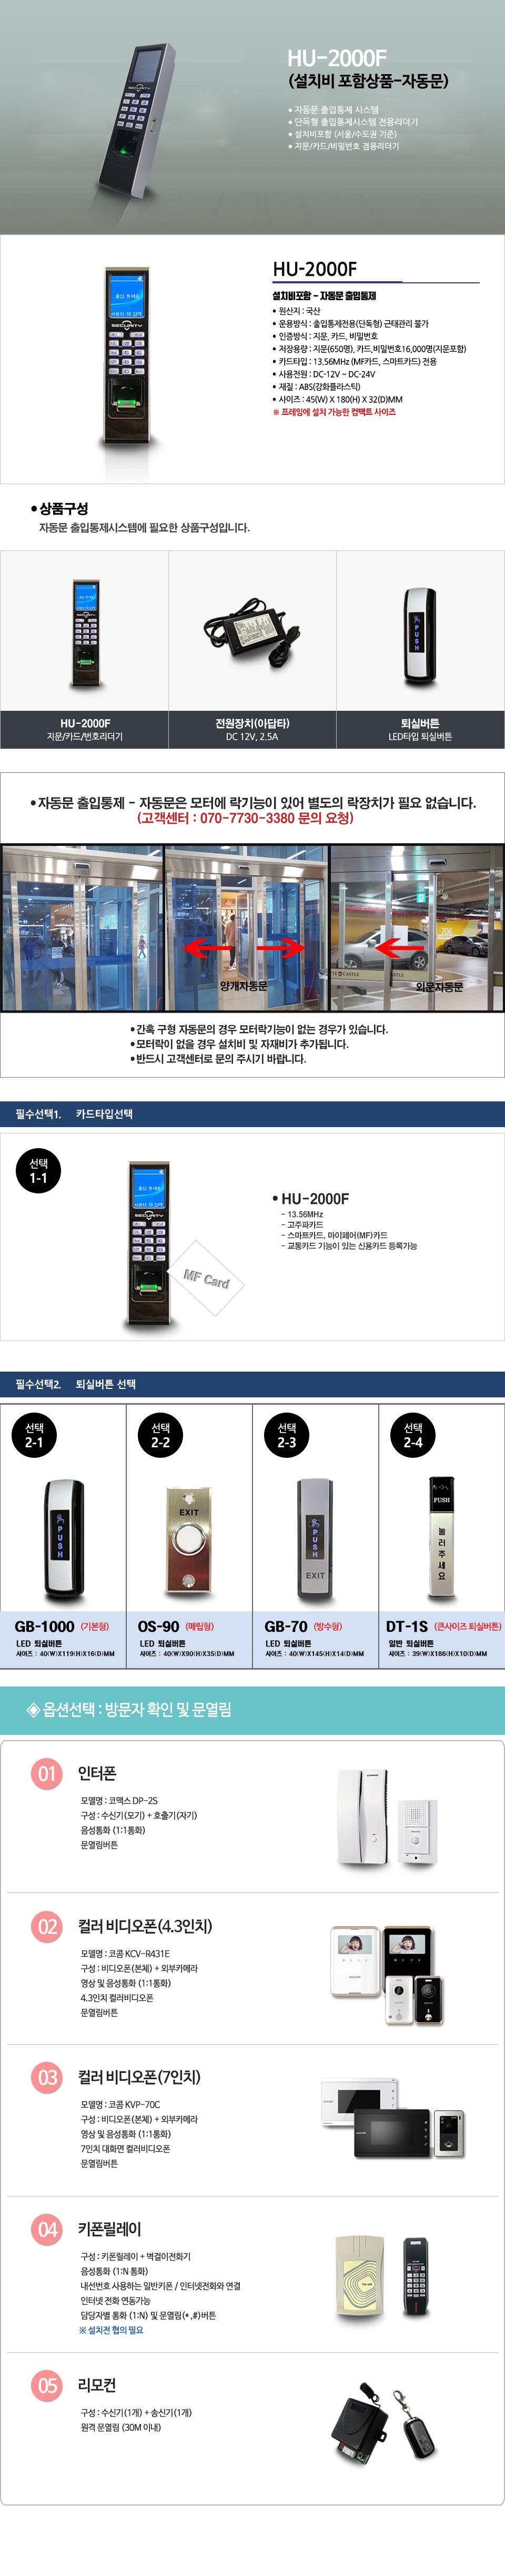 HU-2000F설치비포함작업-자동문.jpg